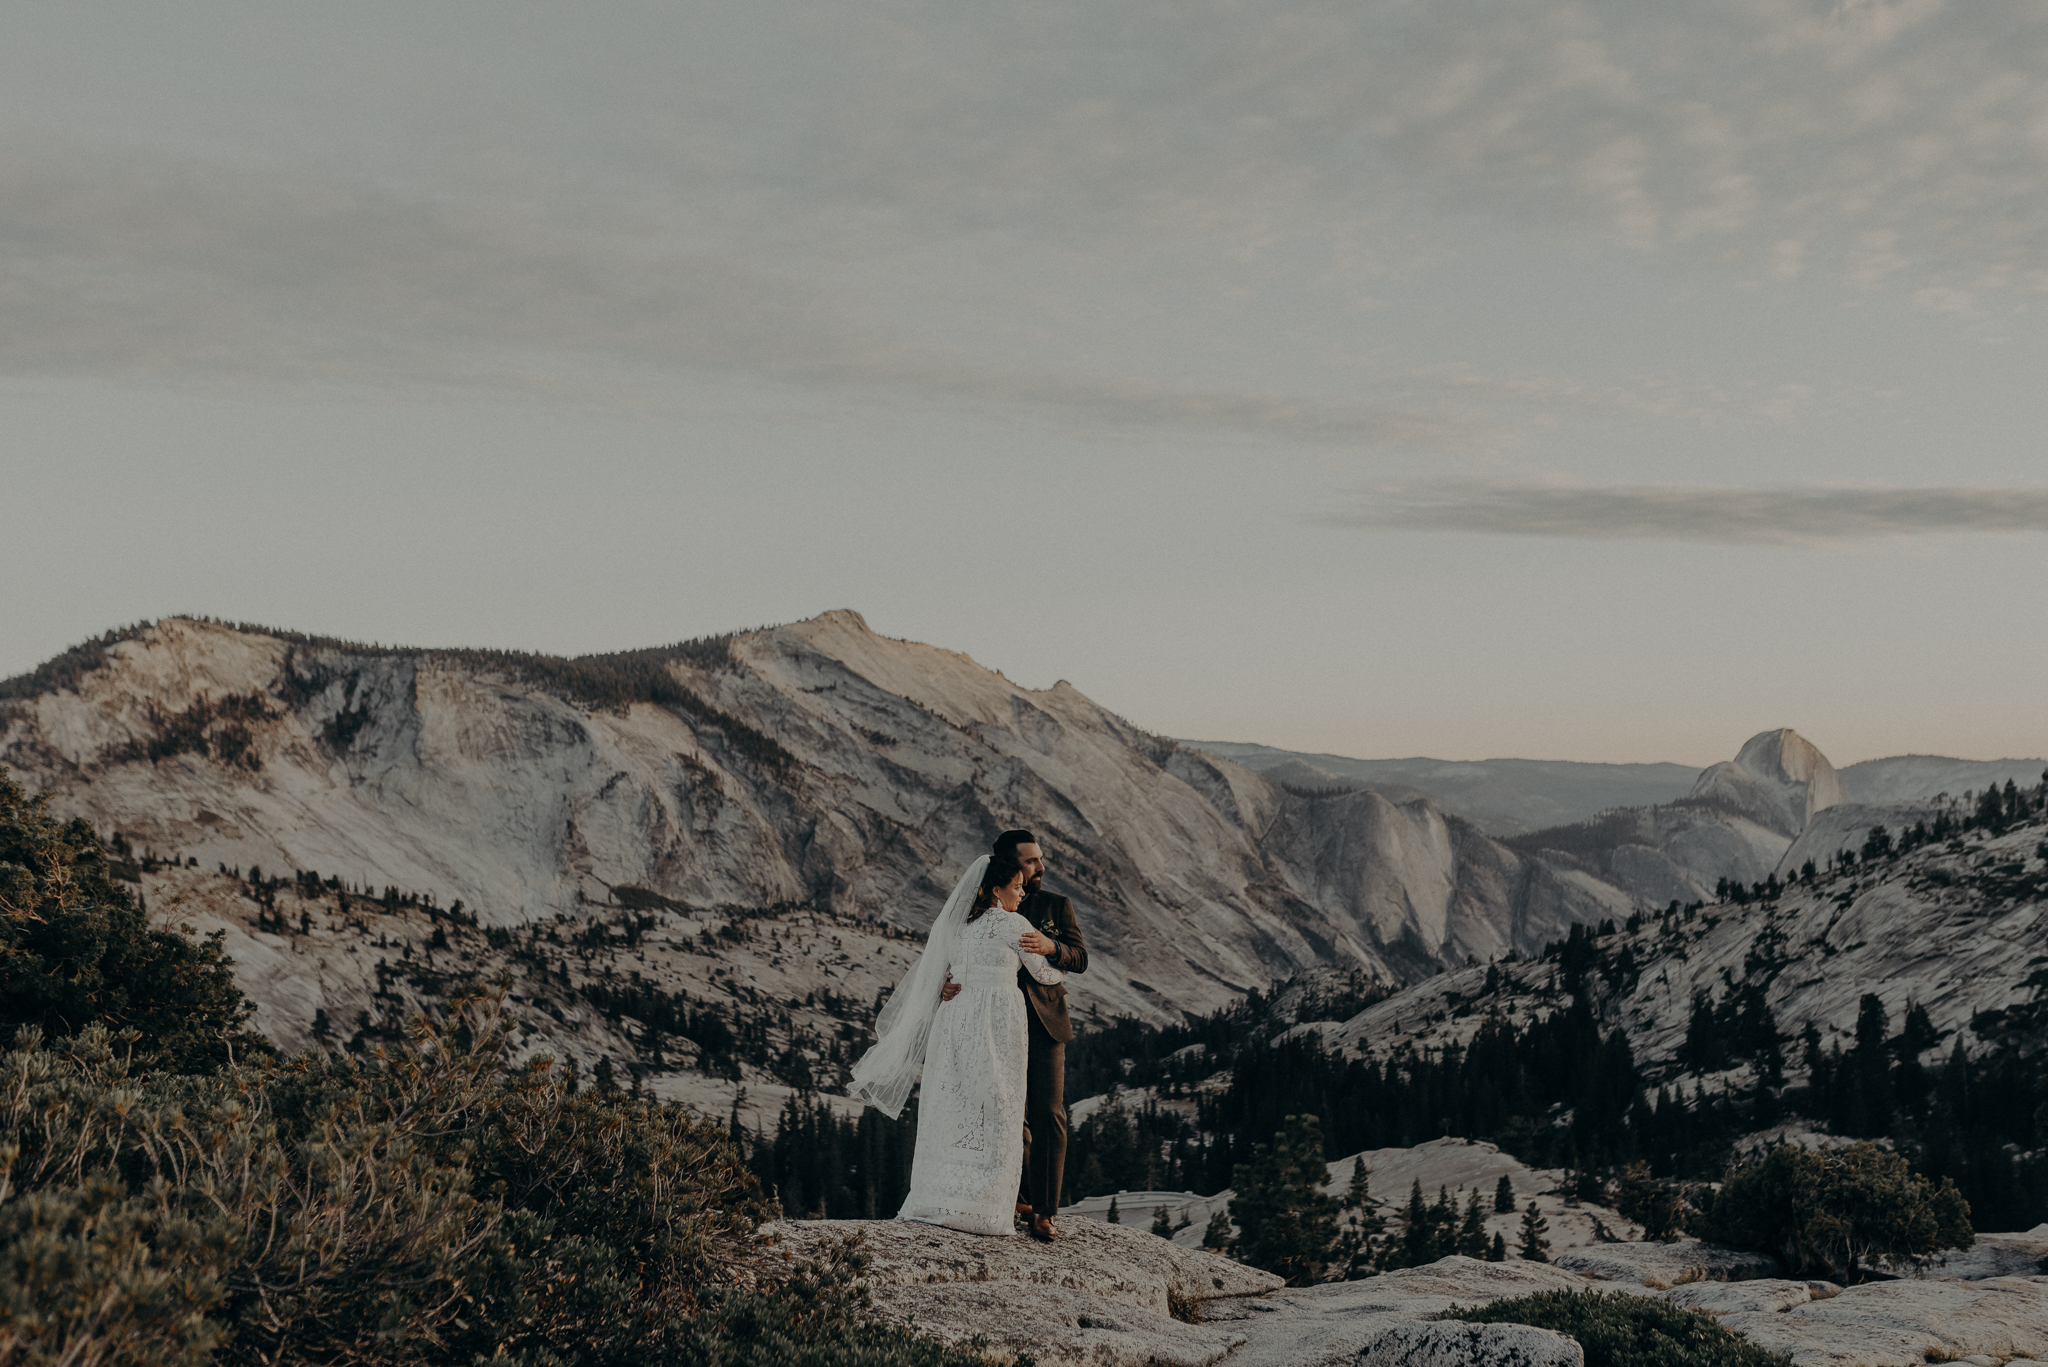 Yosemite Elopement Photographer - Evergreen Lodge Wedding Photographer - IsaiahAndTaylor.com-051.jpg